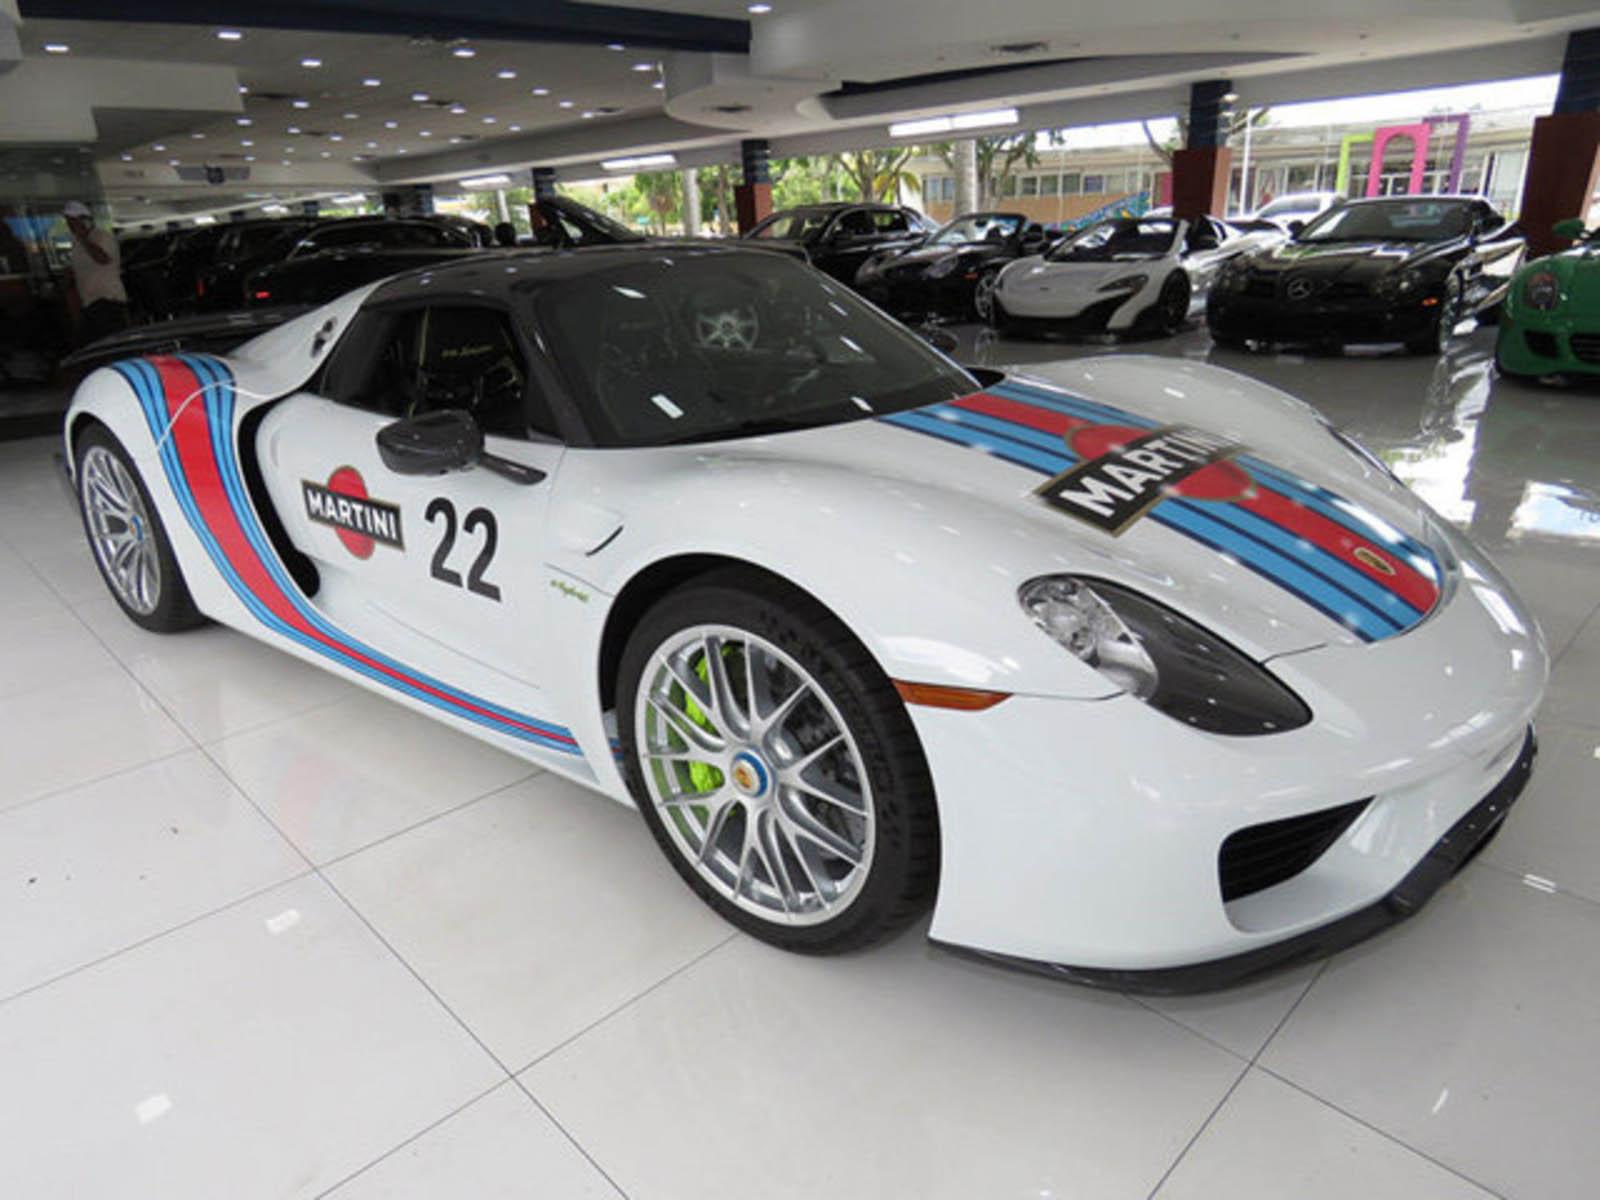 porsche-918-spyder-weissach-florida-04 Amazing Porsche 918 Spyder sold Out Cars Trend